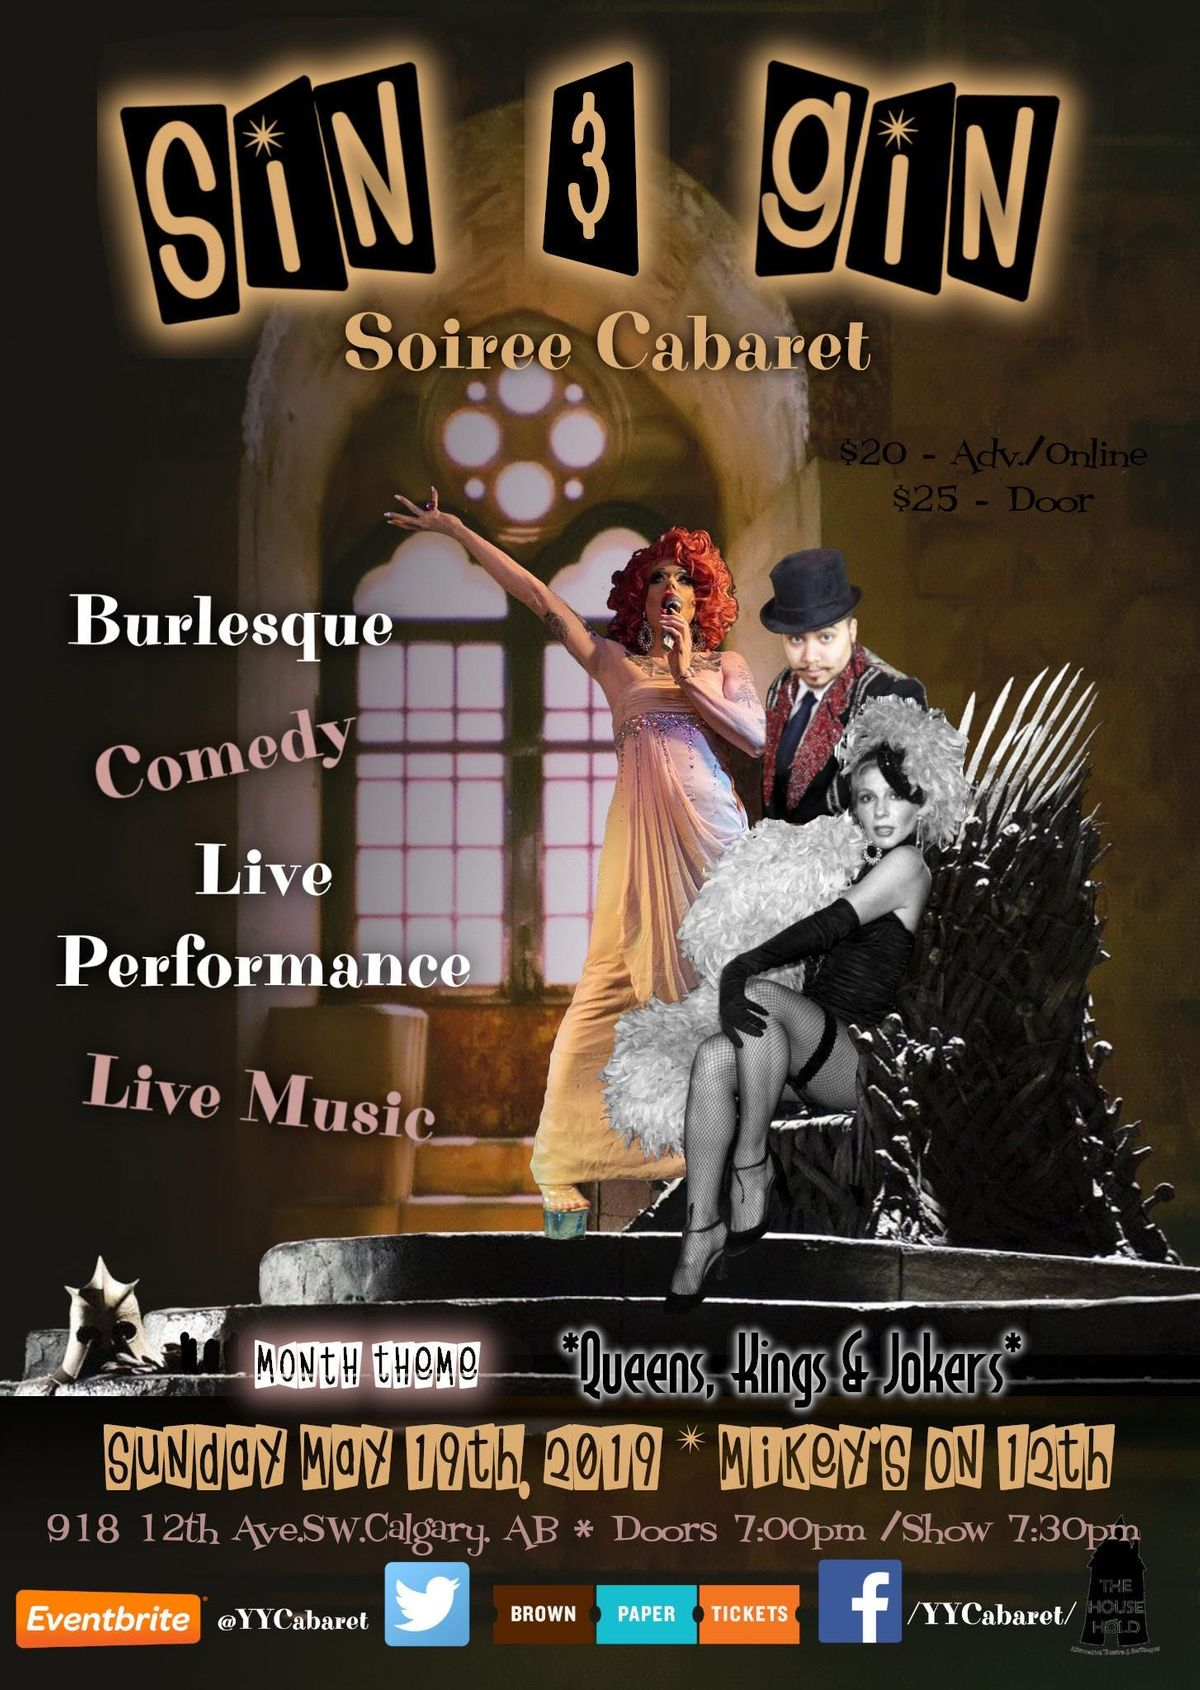 Sin & Gin Soiree Cabaret - Judith Stein Queens Kings & Jokers